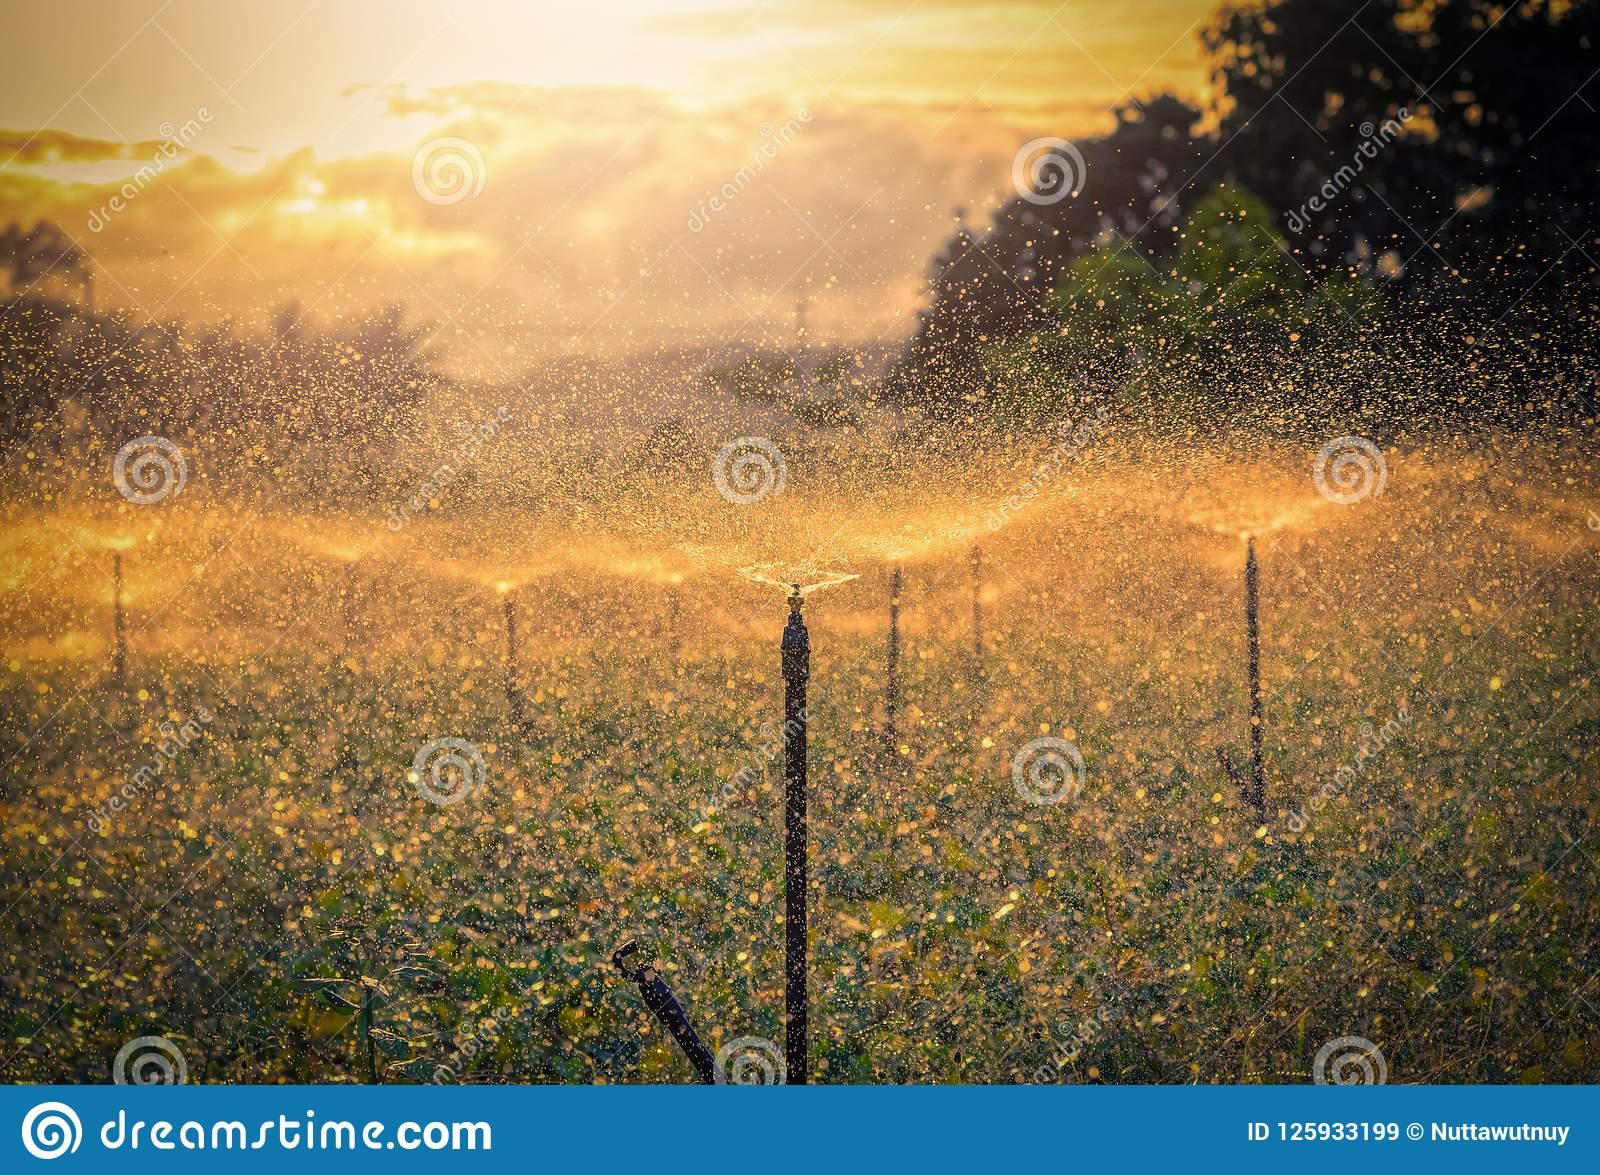 Water Sprinkler System Working In A Green Vegetable Garden At Su ...